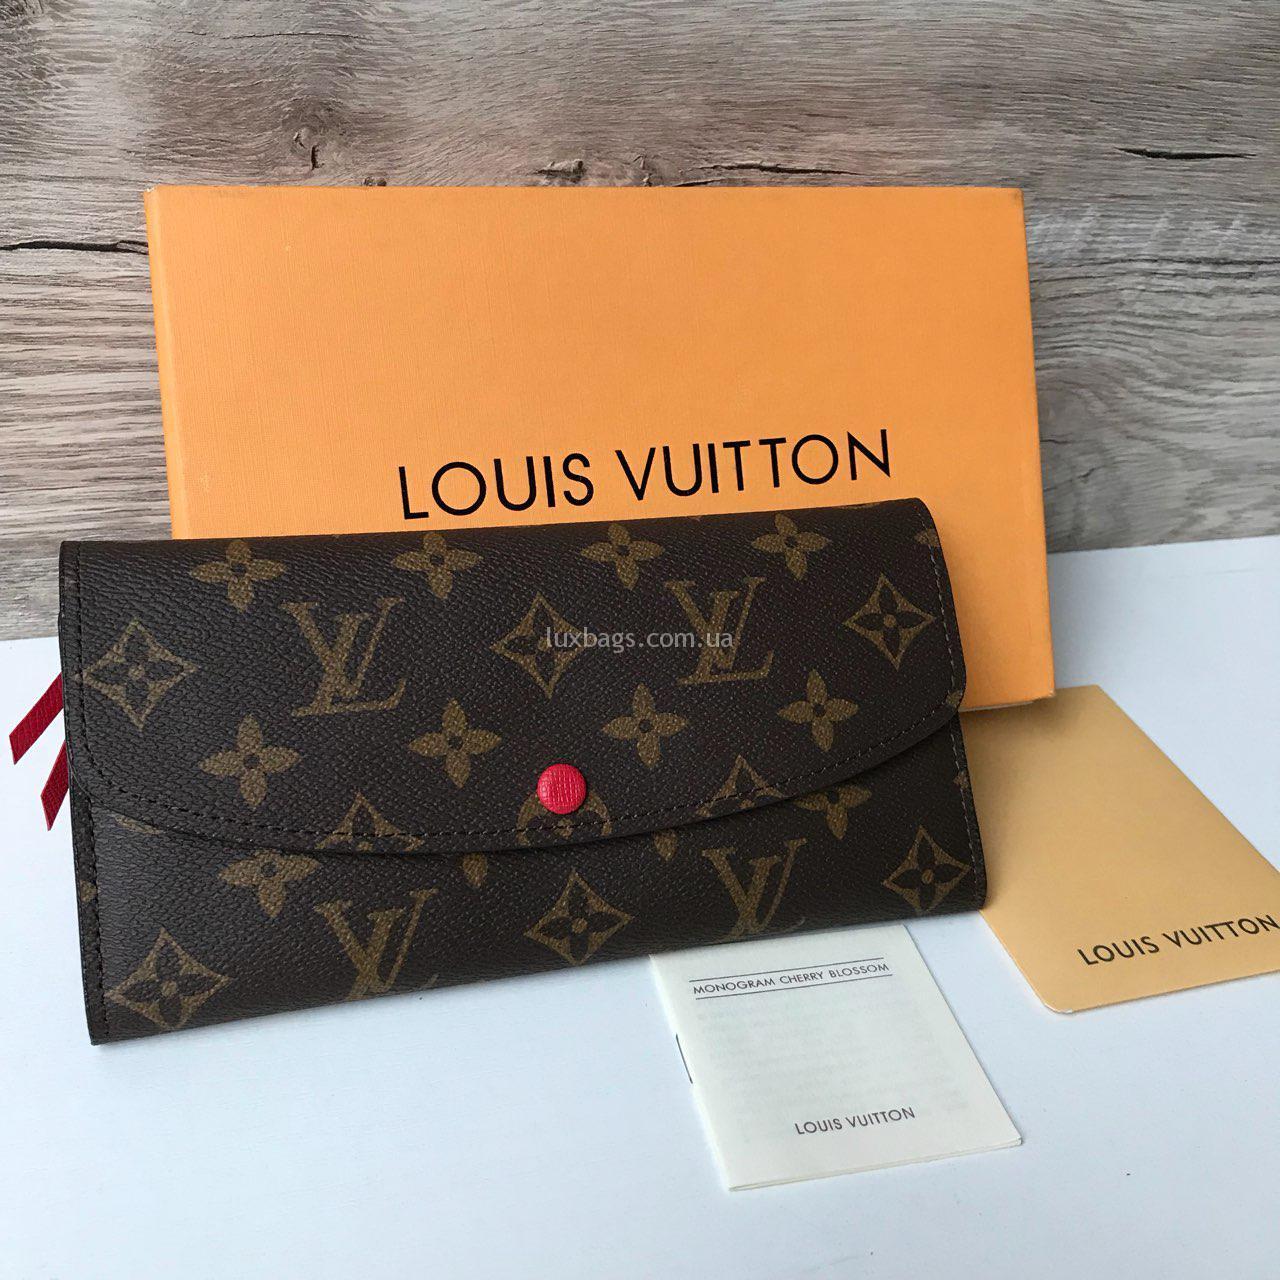 70abd87912ba Женский кошелек Louis Vuitton Луи Виттон Купить на lux-bags